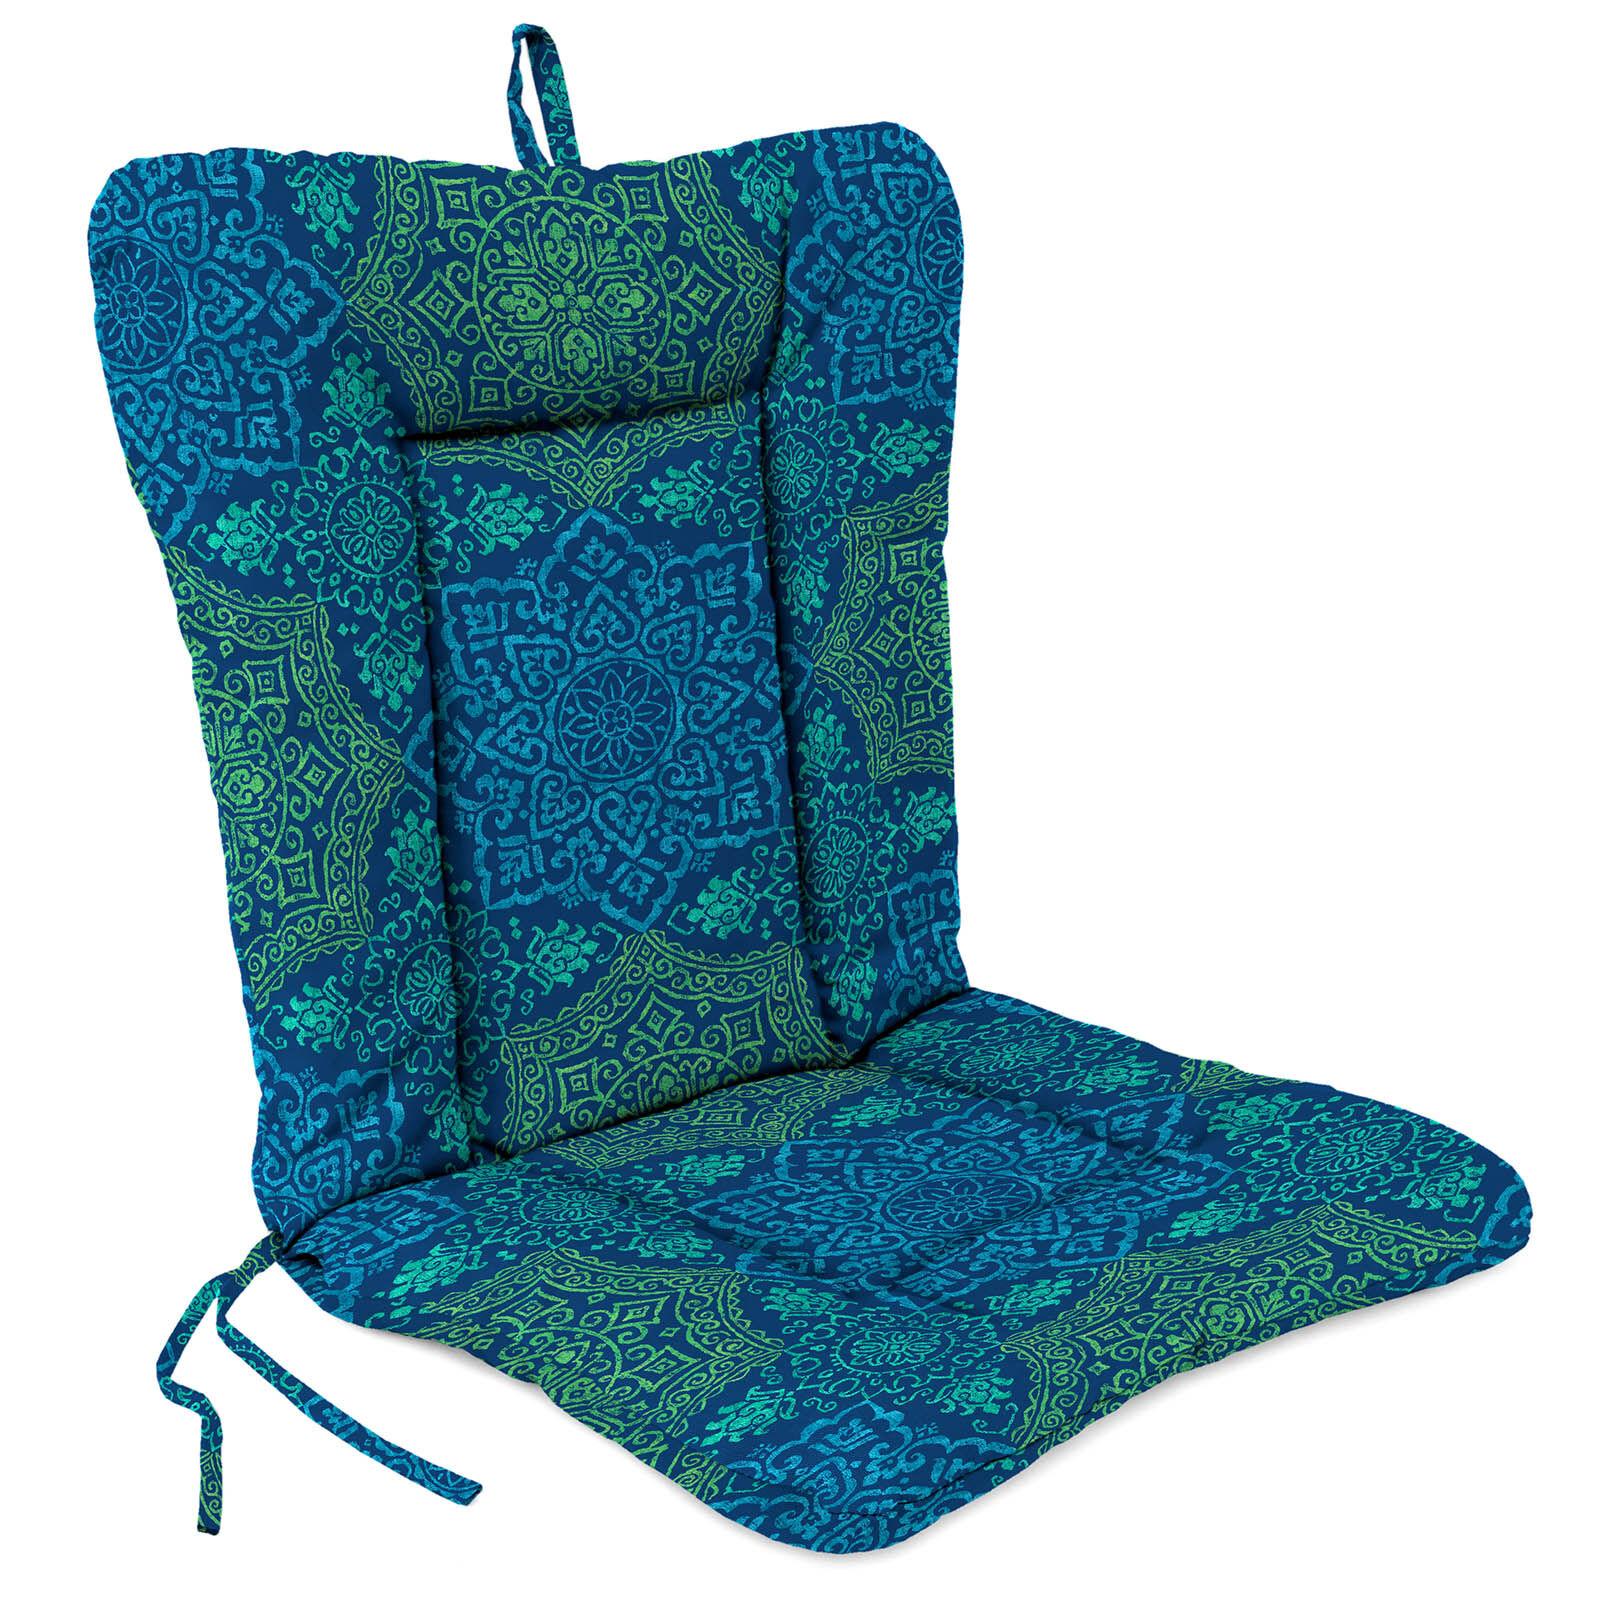 brentwood originals chair pads swivel in rpa arnhistoria